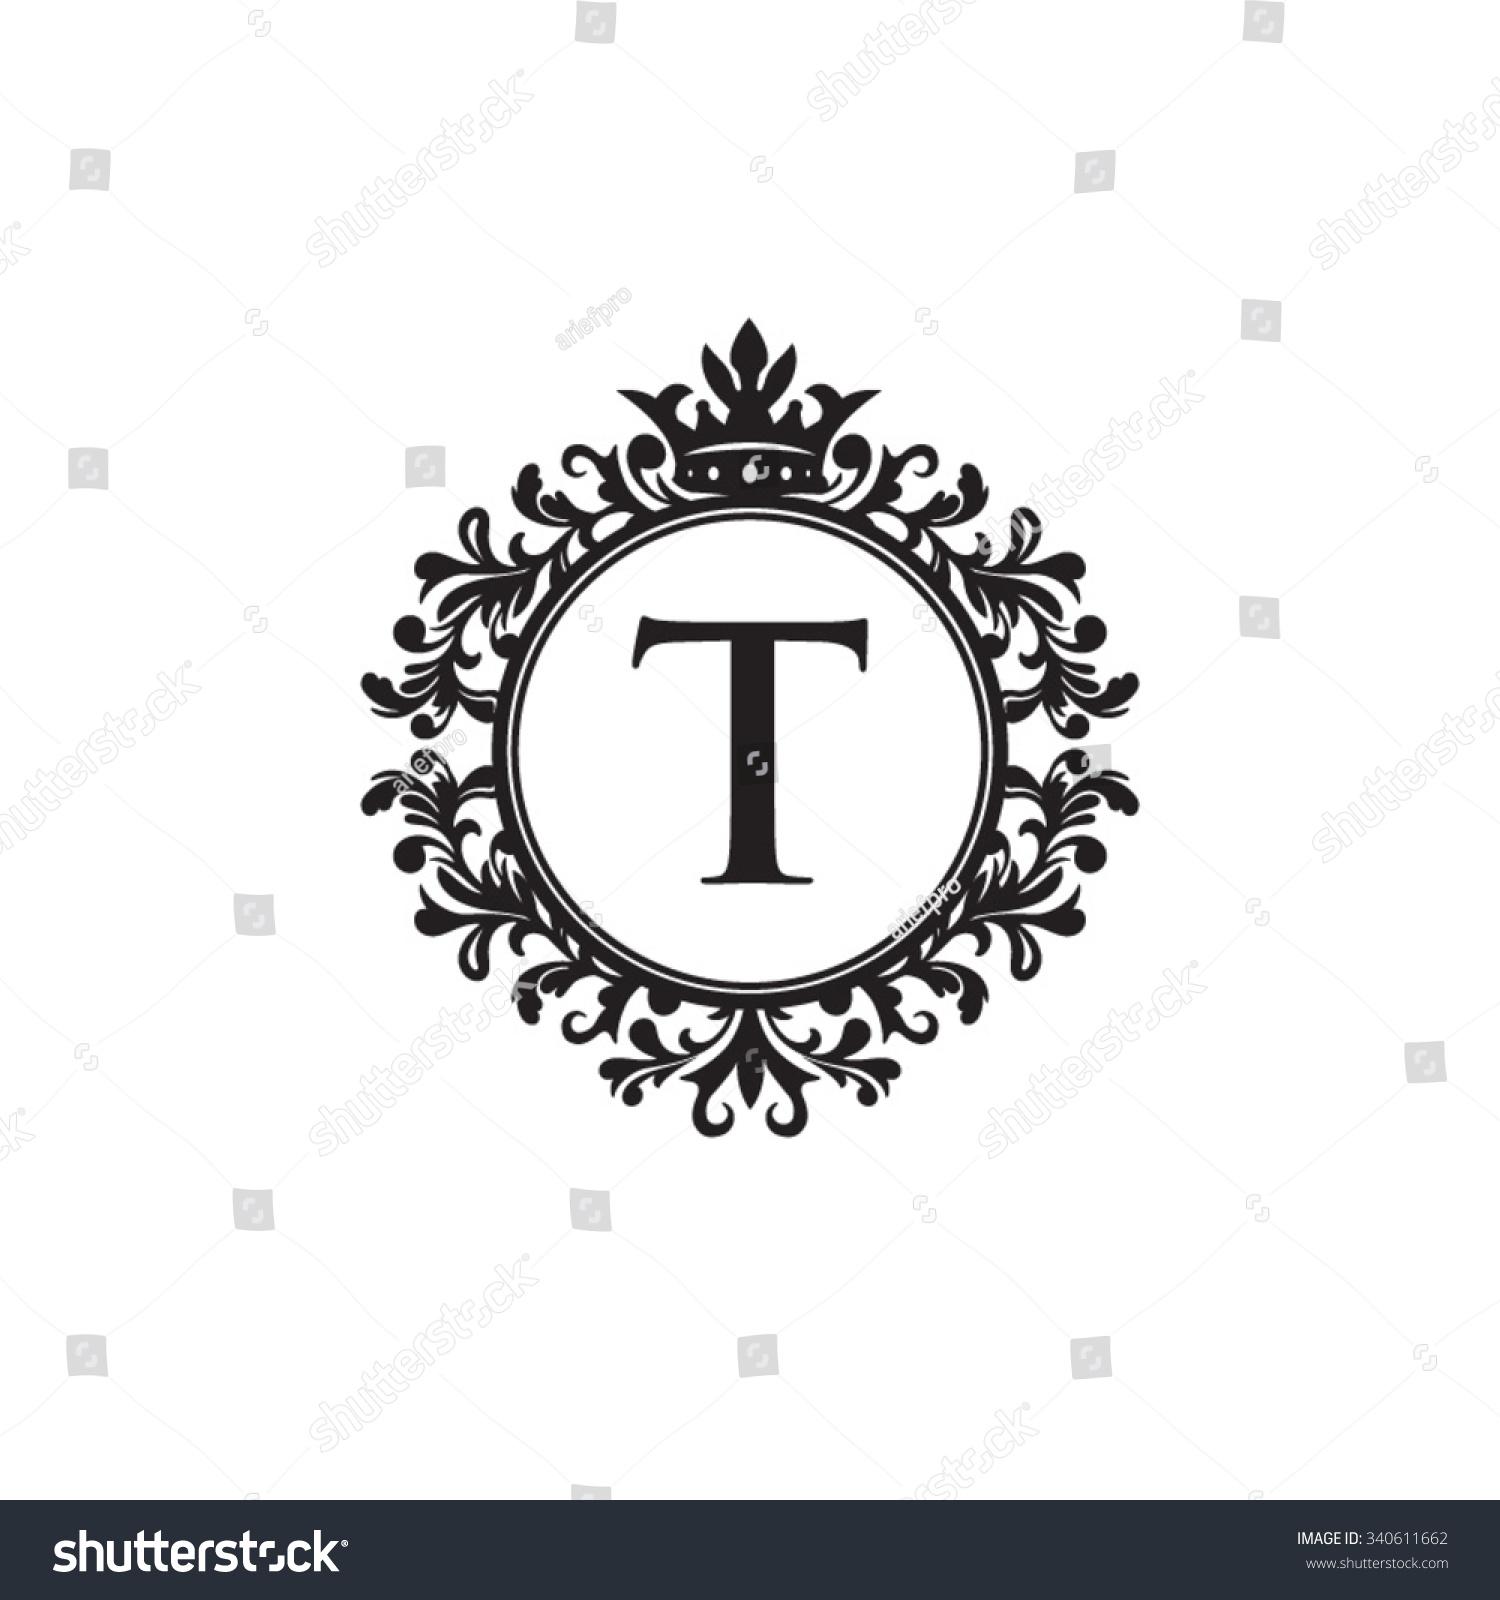 Tj initial luxury ornament monogram logo stock vector - T Initial Logo Luxury Ornament Crown Logo